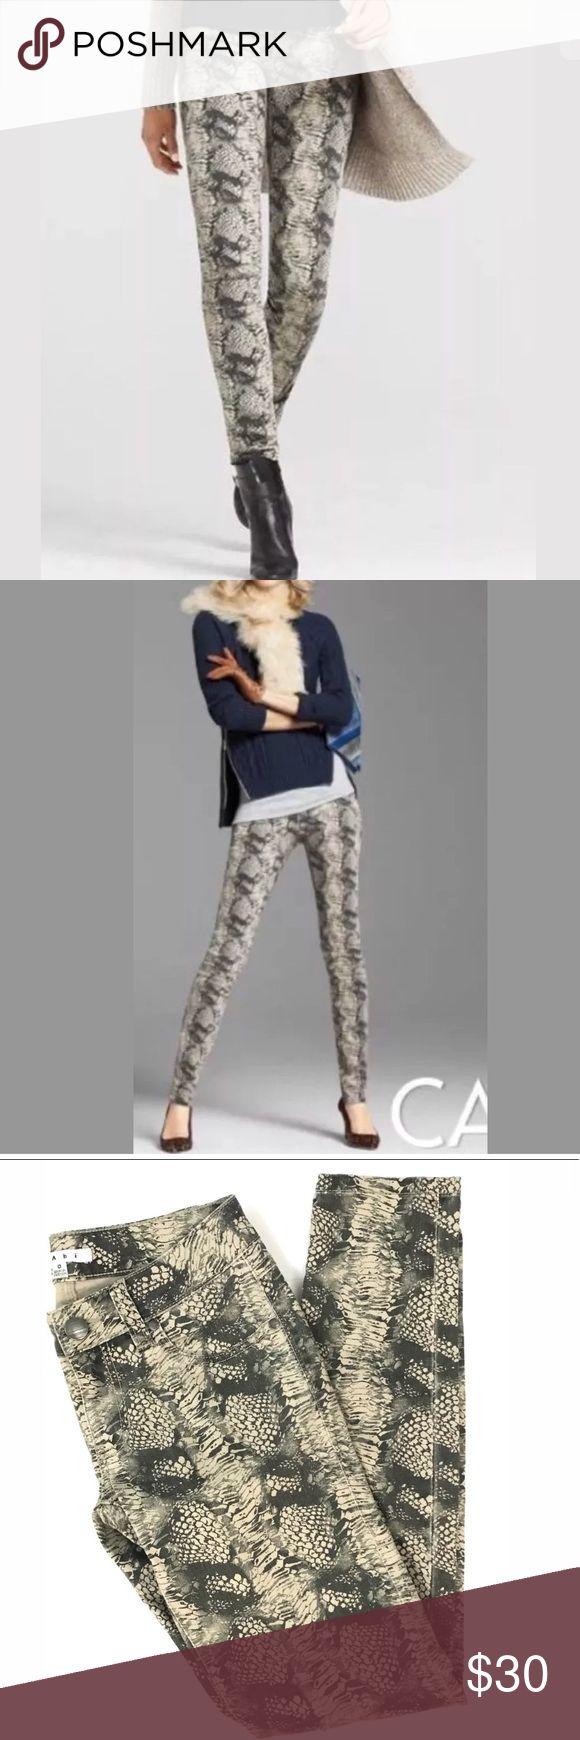 "Cabi #958 Diamondback Snakeskin Print Skinny Jeans Excellent like new! Size zero. 28"" waist 7"" rise 30"" inseam. CAbi Jeans Skinny"